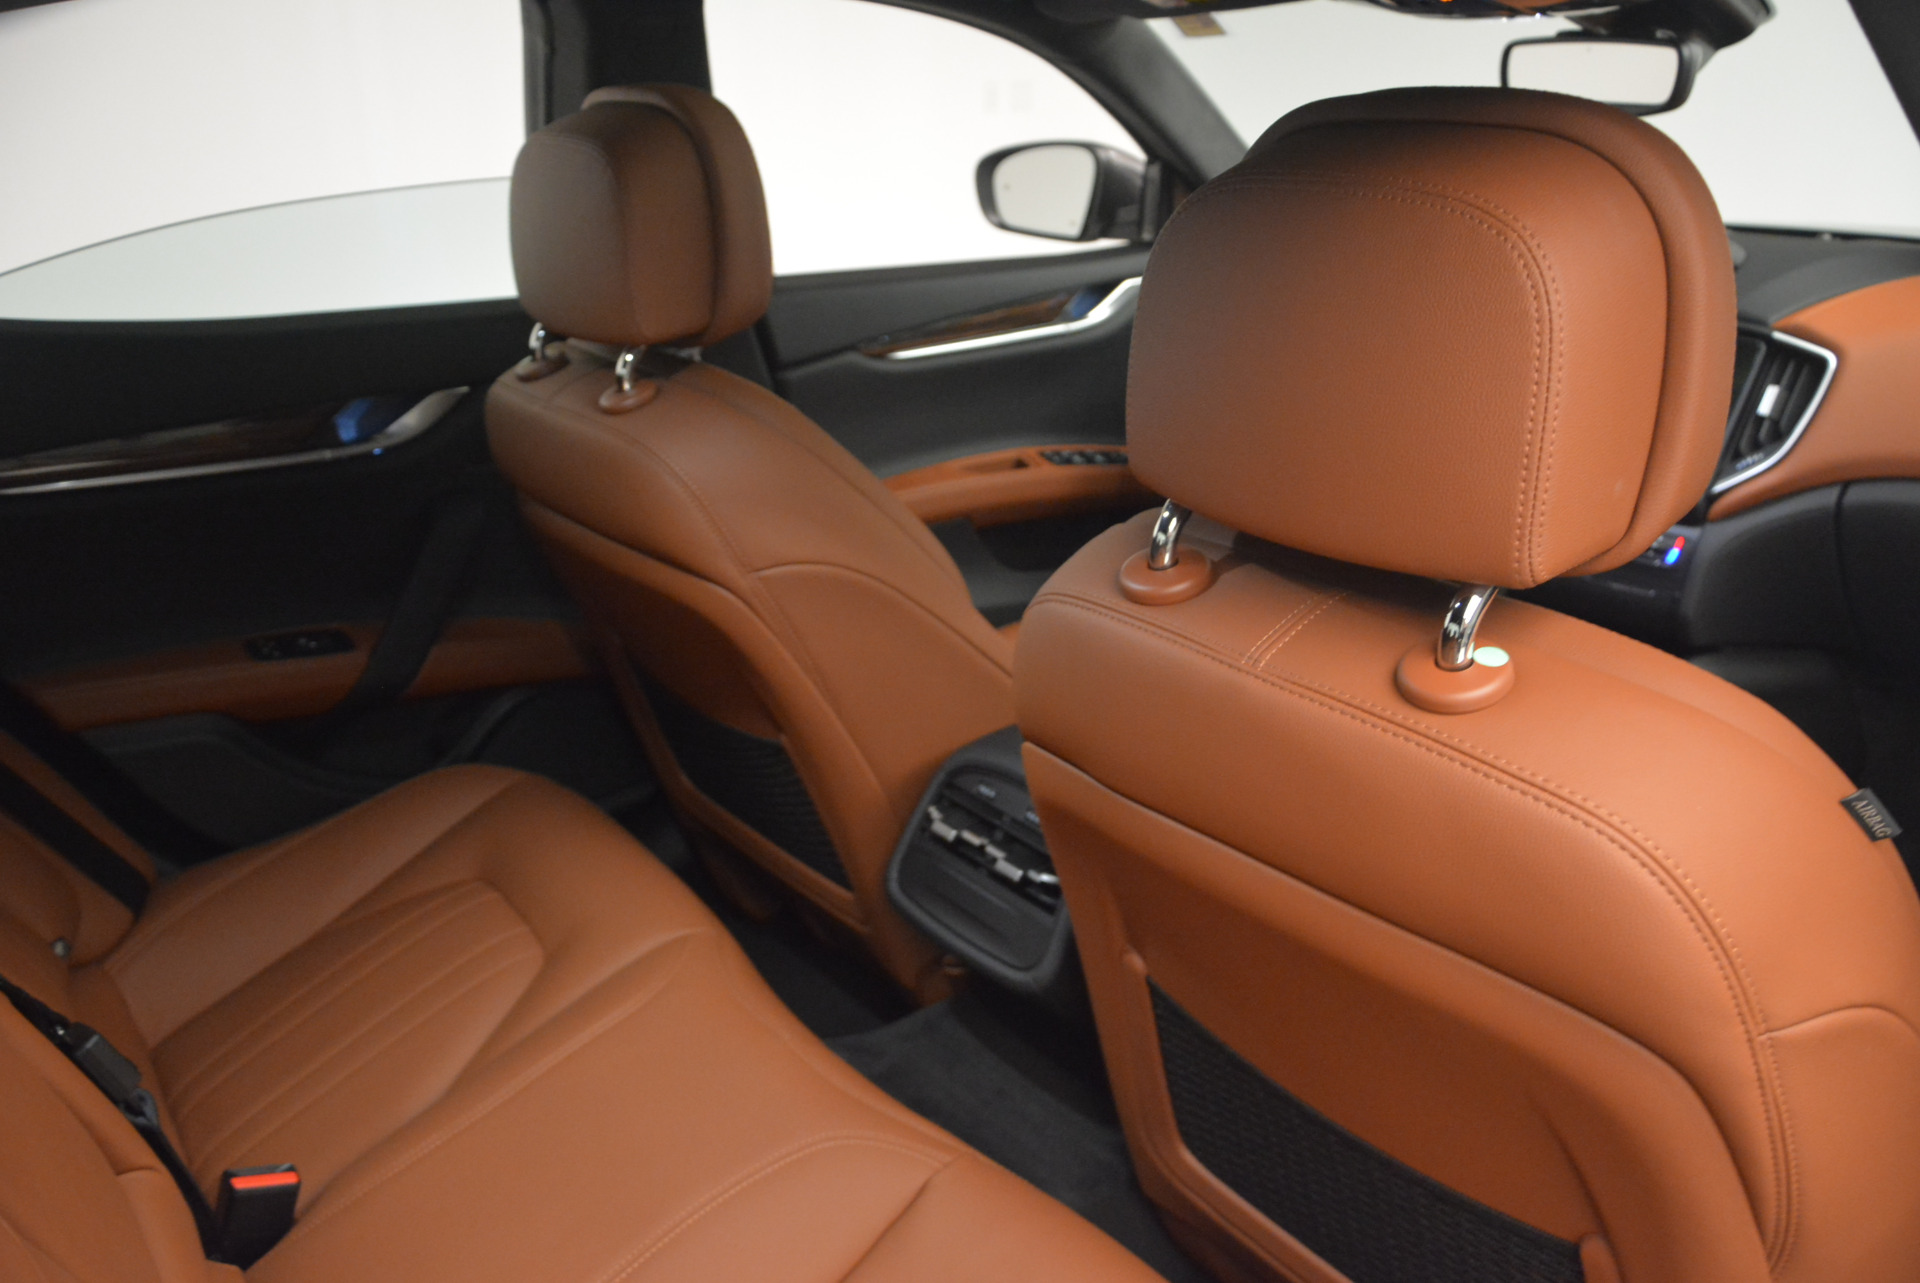 Used 2017 Maserati Ghibli S Q4  EX-LOANER For Sale In Westport, CT 565_p22